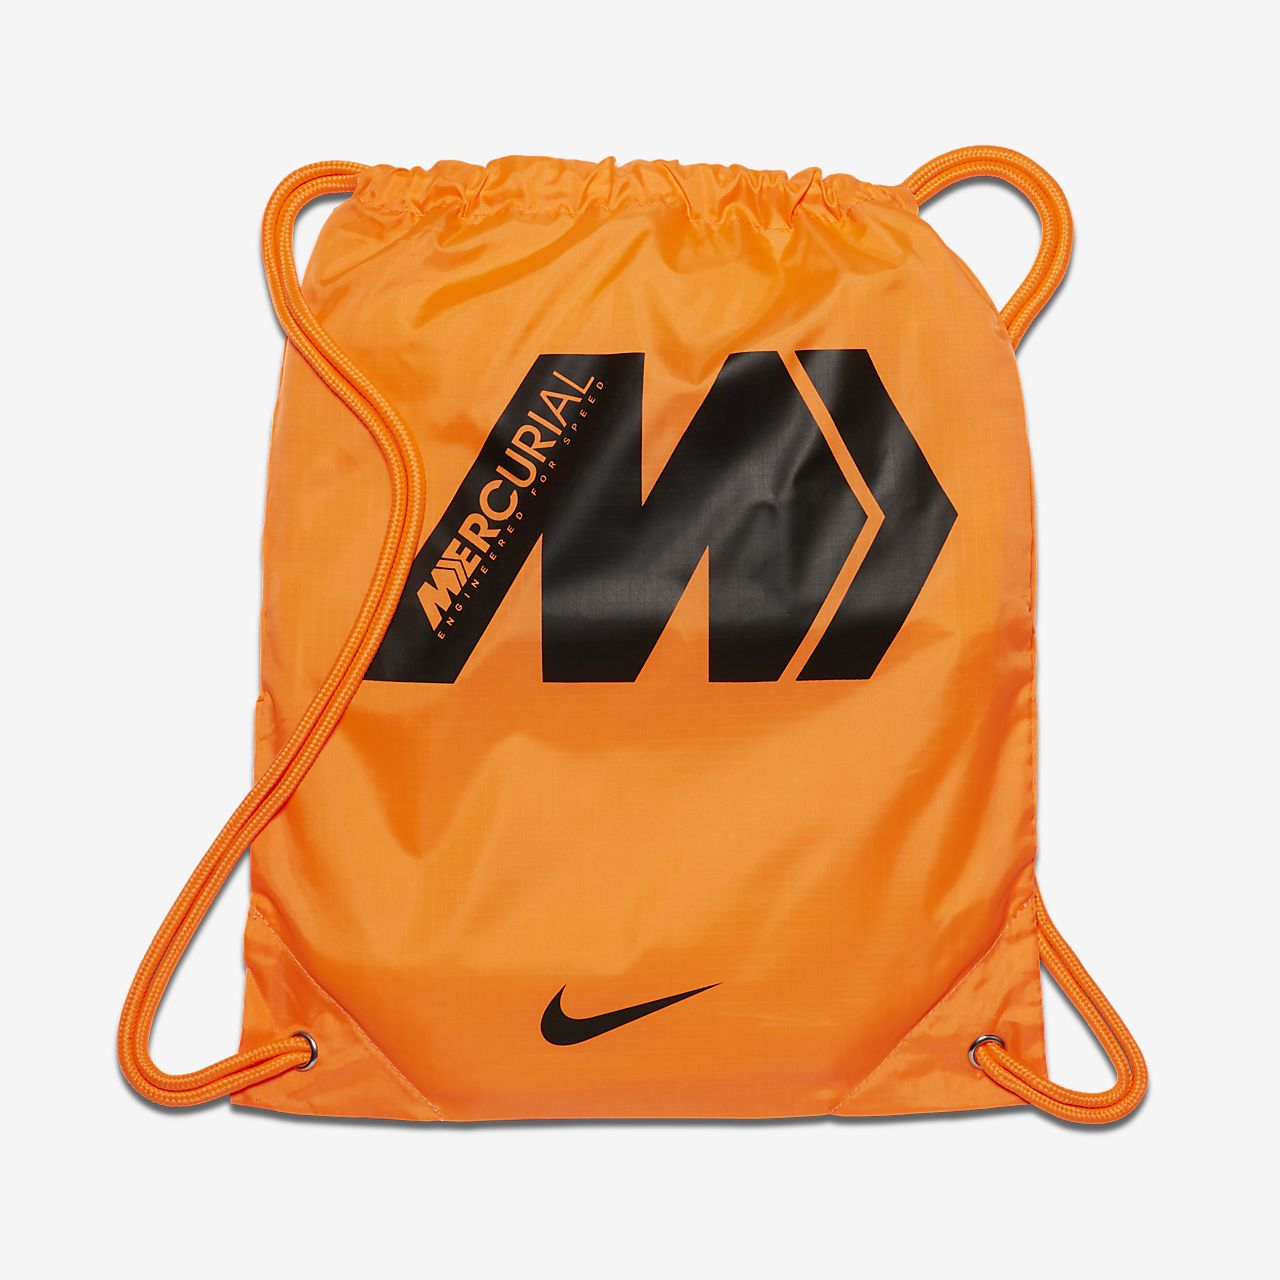 ... Shoe Bag 2.0 Bk Ba4711-072 - Bags Boot  best website 7187d 738ea NIKE  FOOTBALL BOOT BAG 3.0  super cute 32afd f3f19 ... Nike Mercurial Superfly  360 ... 0e5c5ddf09df2